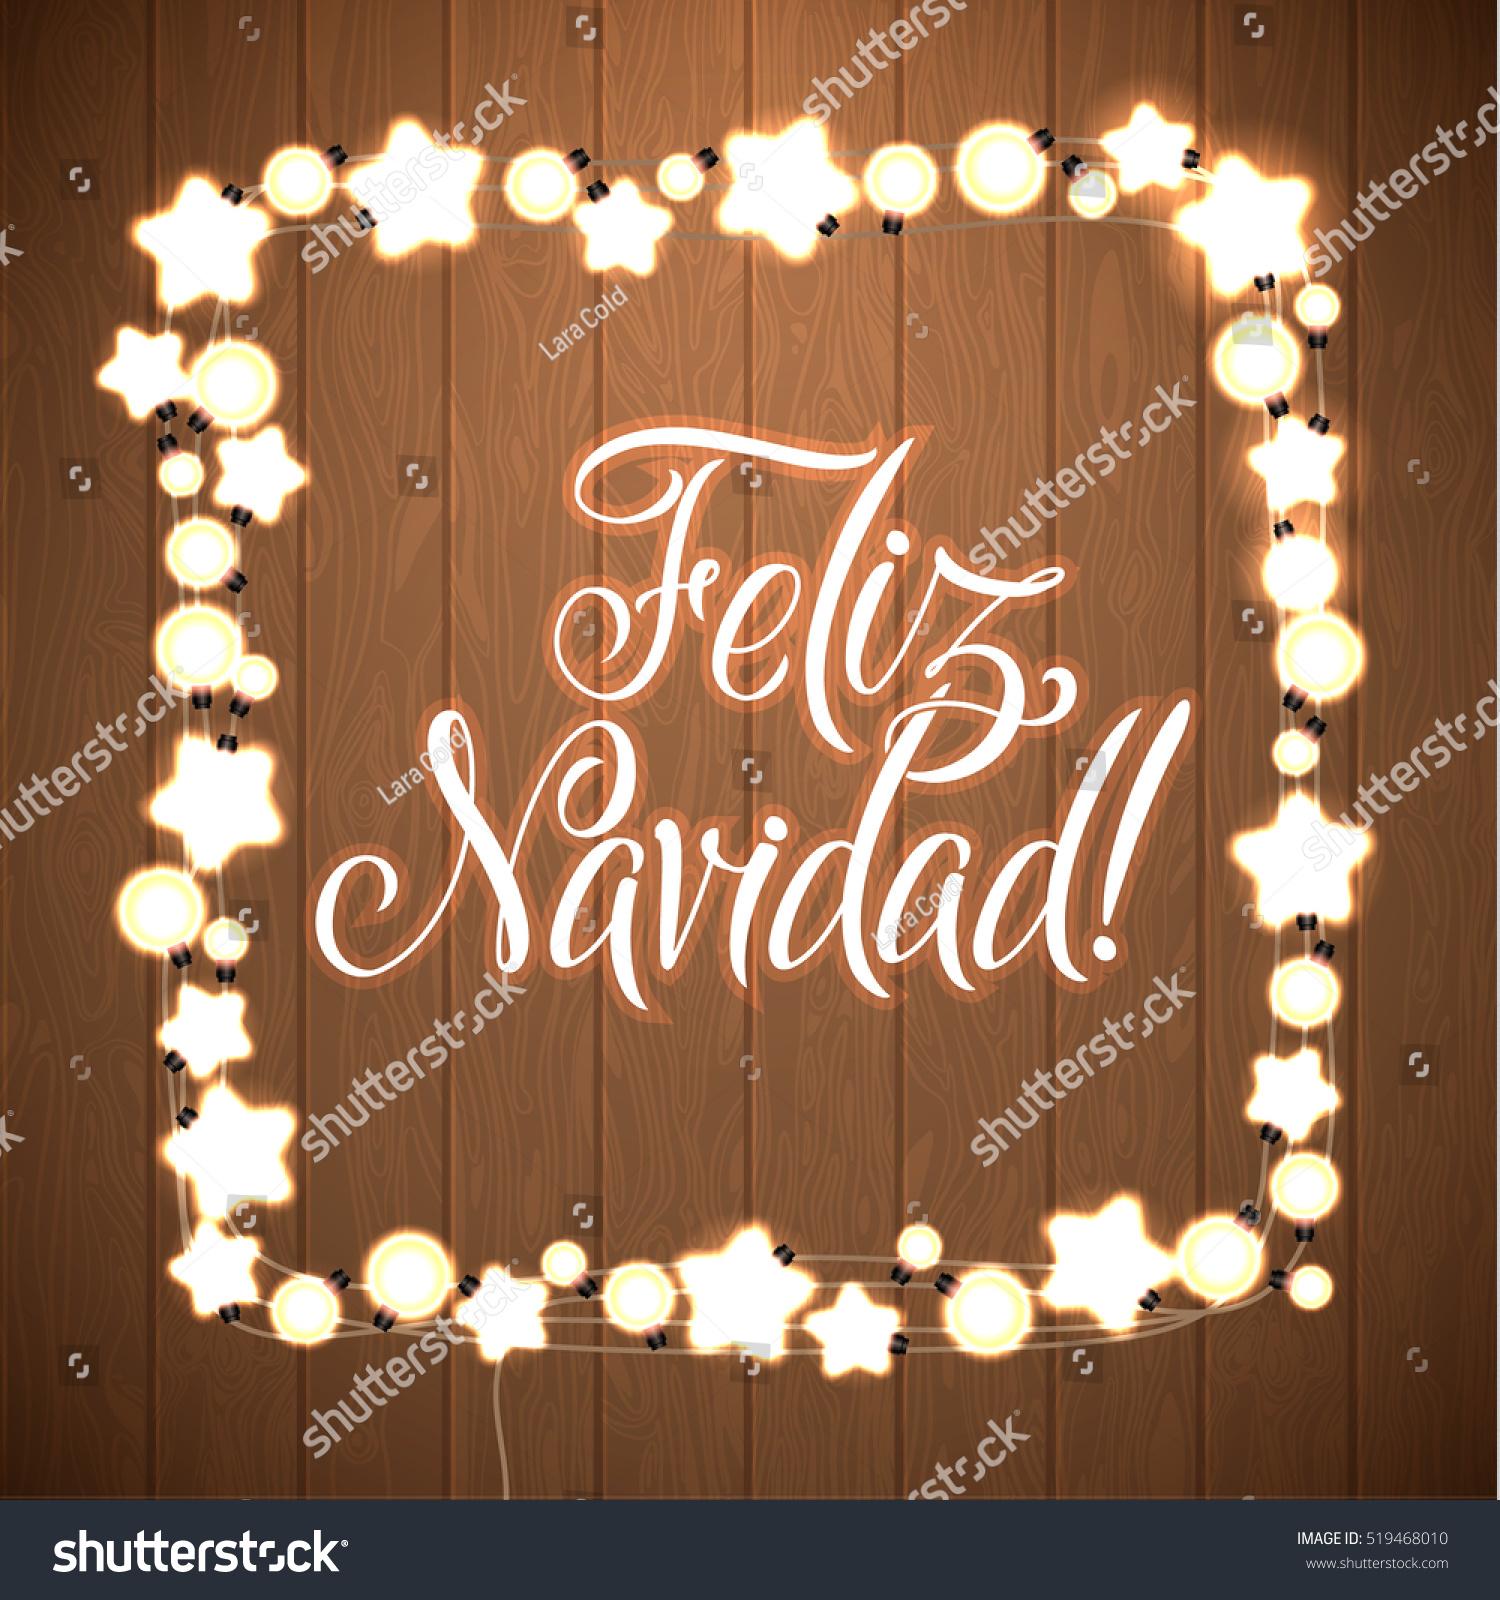 how do i say merry christmas in spanish curtain design lajada - How Do You Say Merry Christmas In Spanish